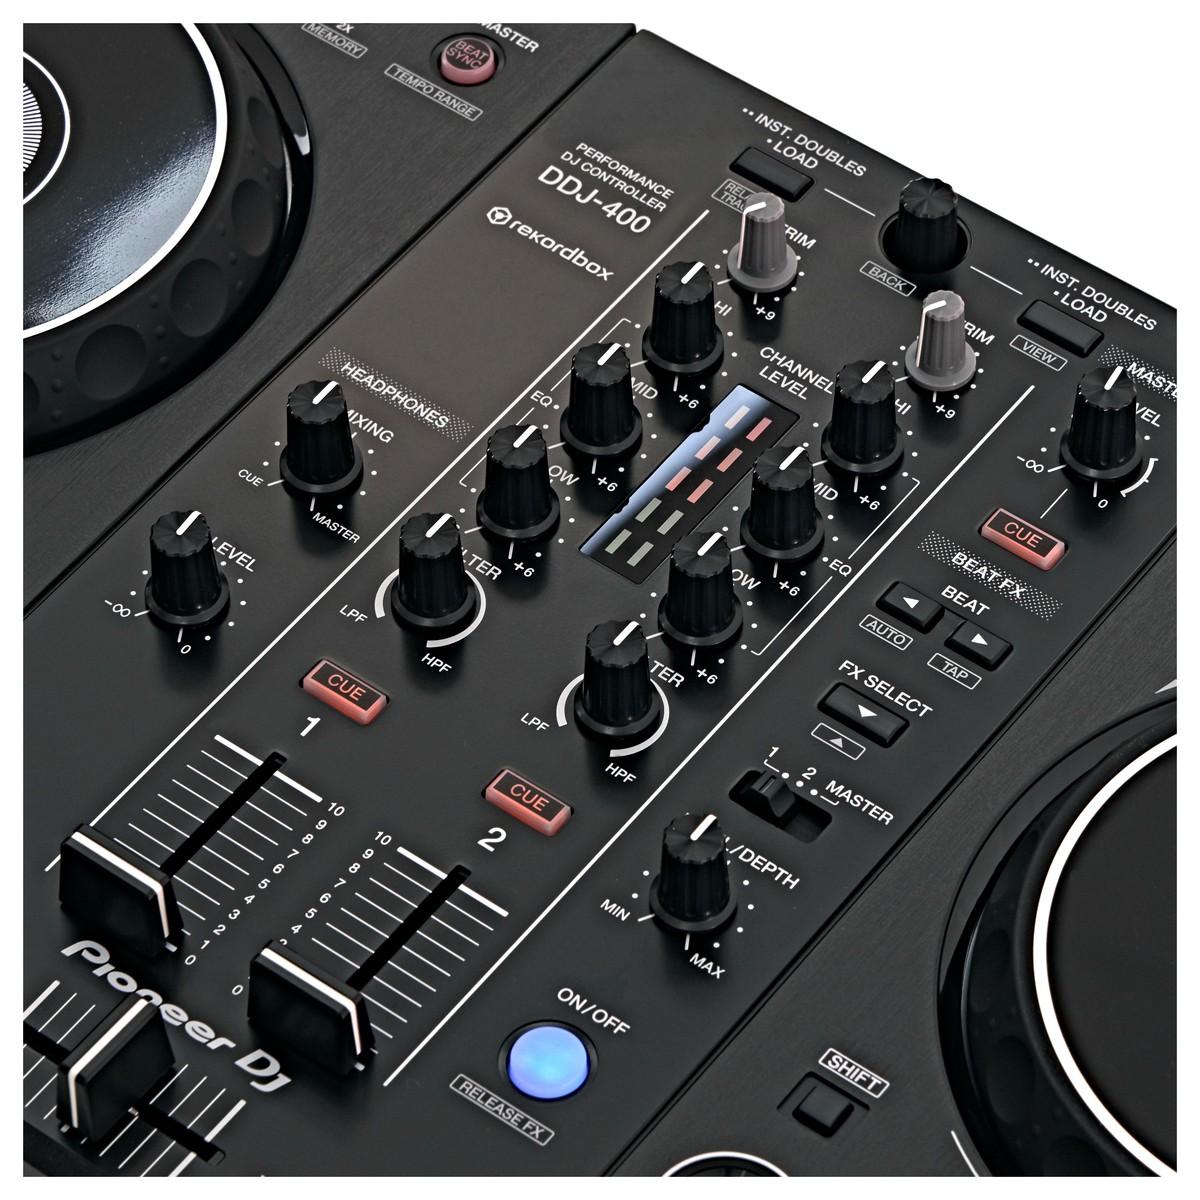 Pioneer DDJ-400 Rekordbox Controller at Gear4music 448d8af6e8